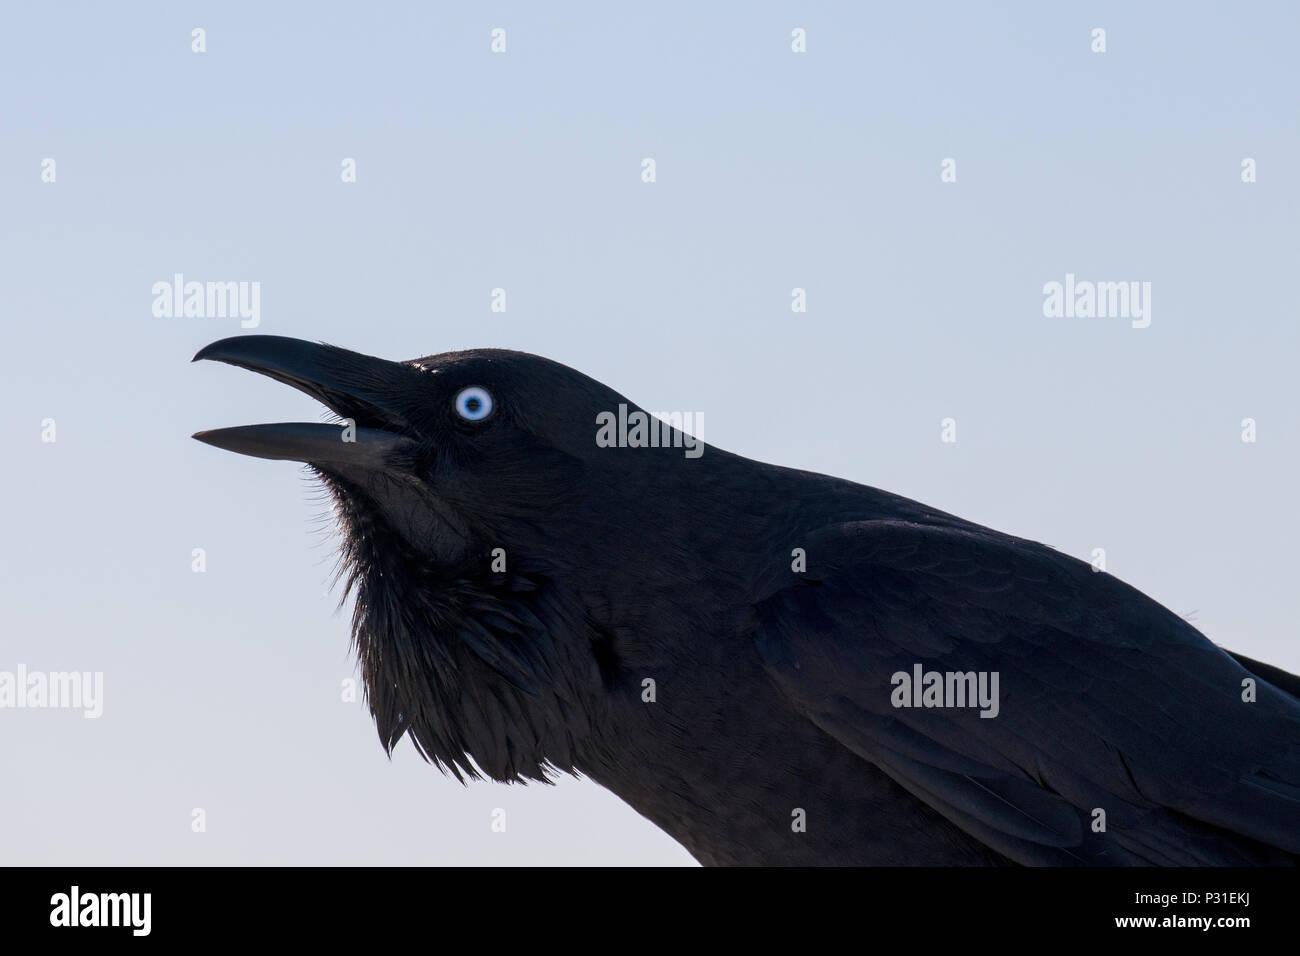 Australian Raven - Stock Image